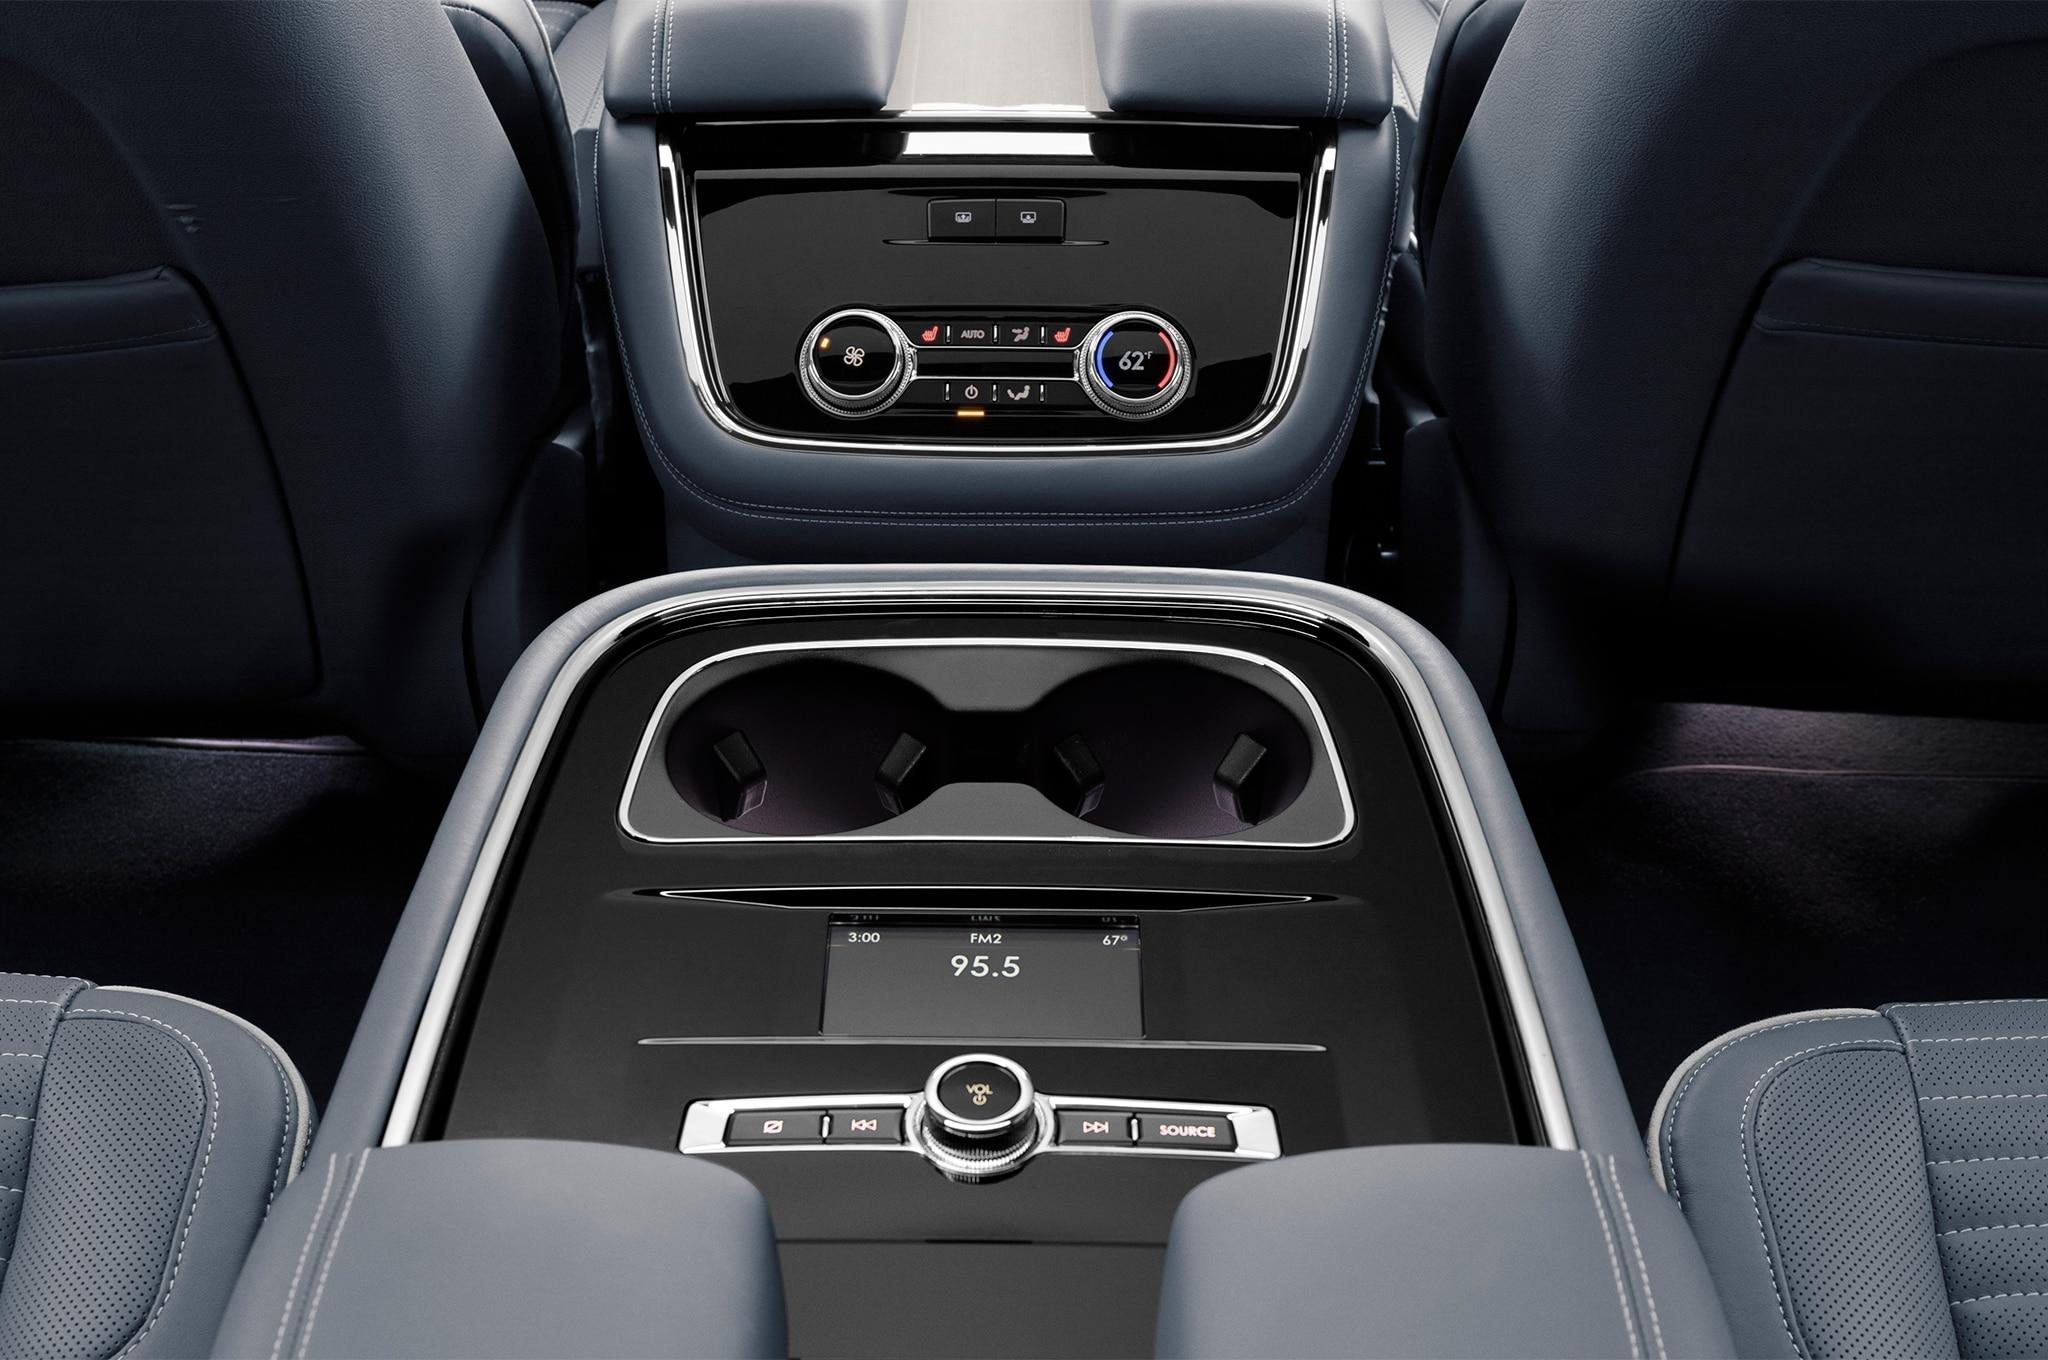 2017 Lincoln Navigator Msrp >> Lincoln Navigator Concept Debuts at 2016 New York Auto Show